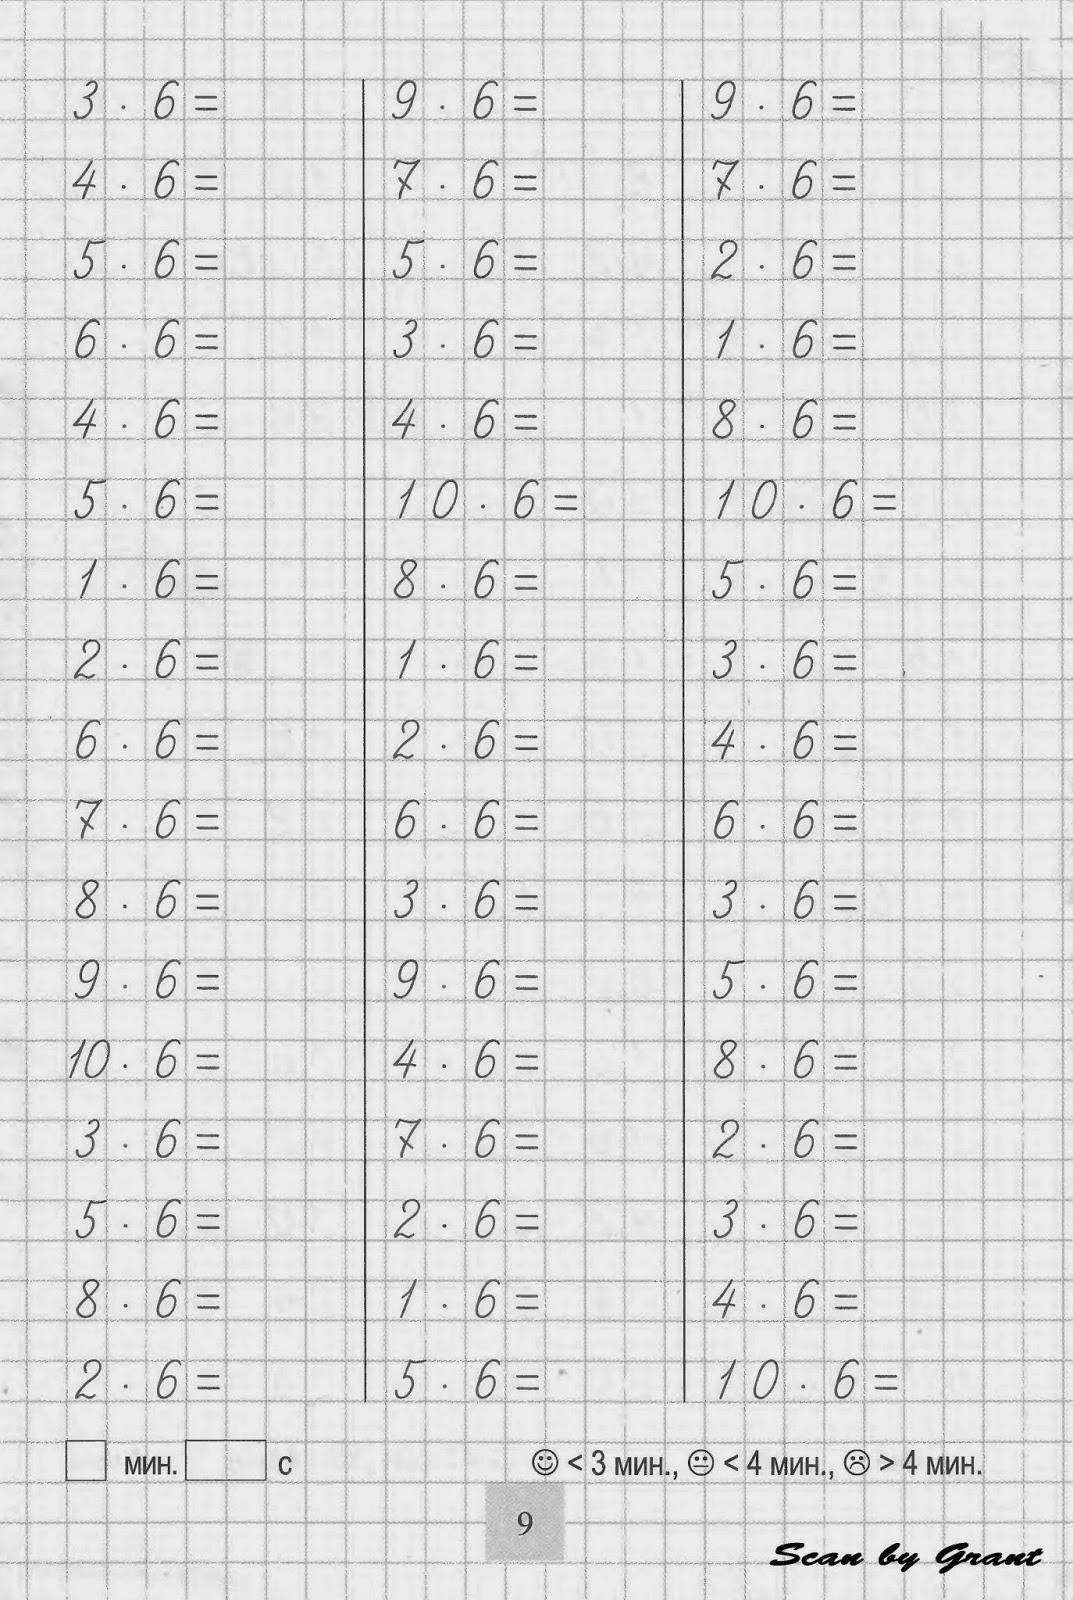 Решебник по математике 6 класс тематический тренажер лысенко кулабухова